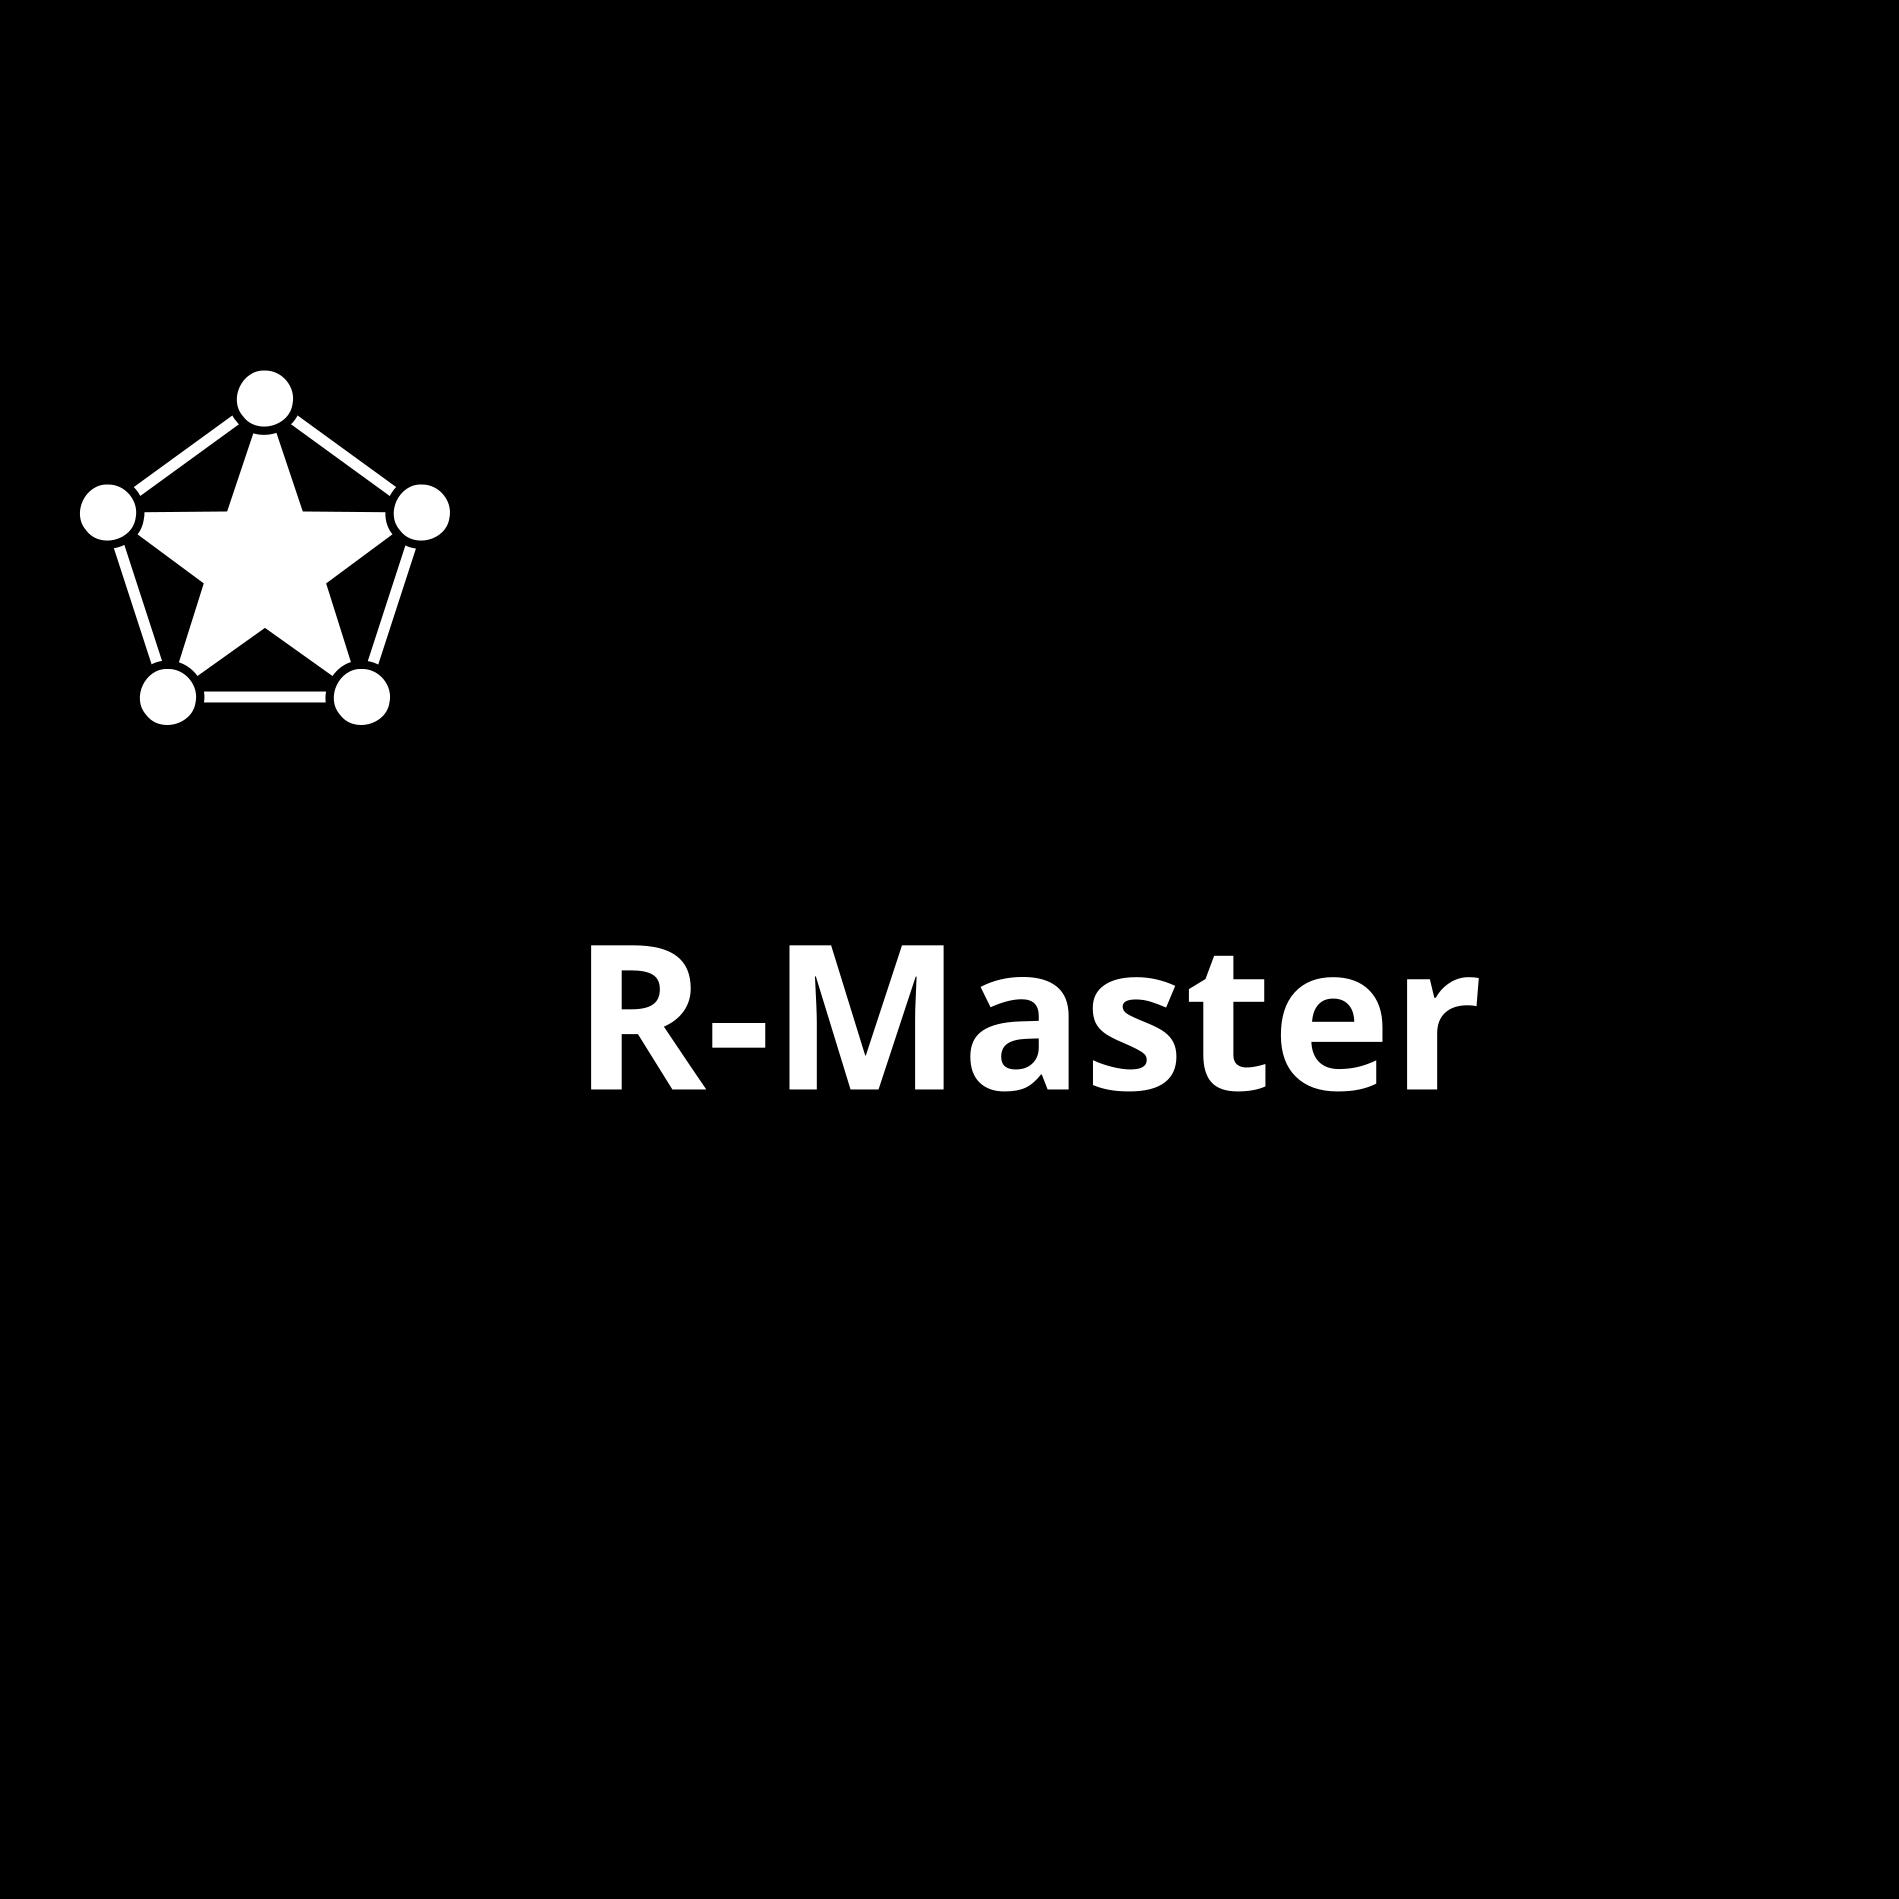 RMaster